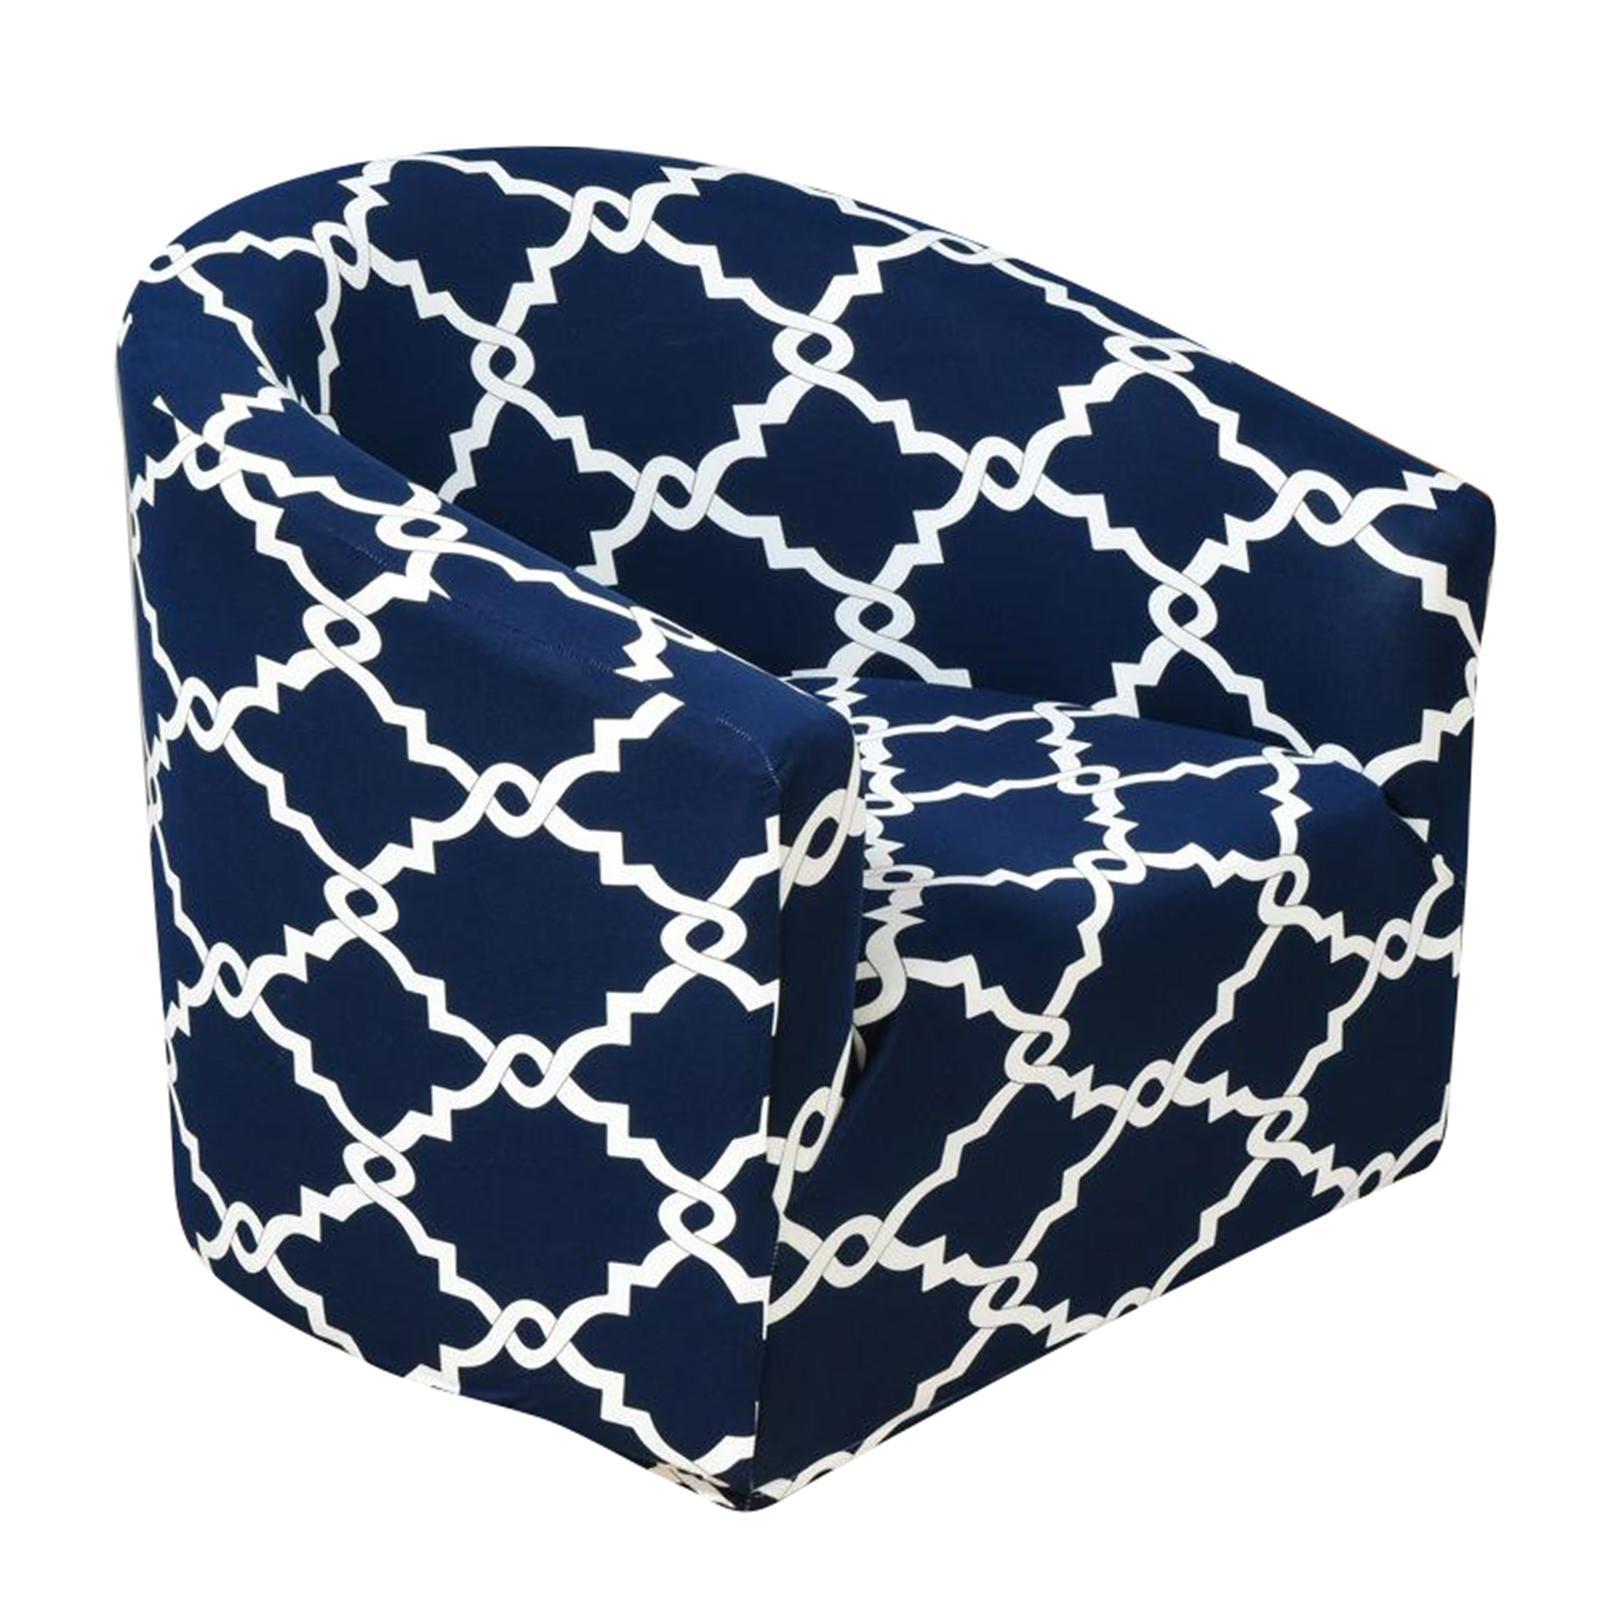 miniatura 10 - Fodera per poltrona singola per poltrona Fodera per sedia in colori assortiti